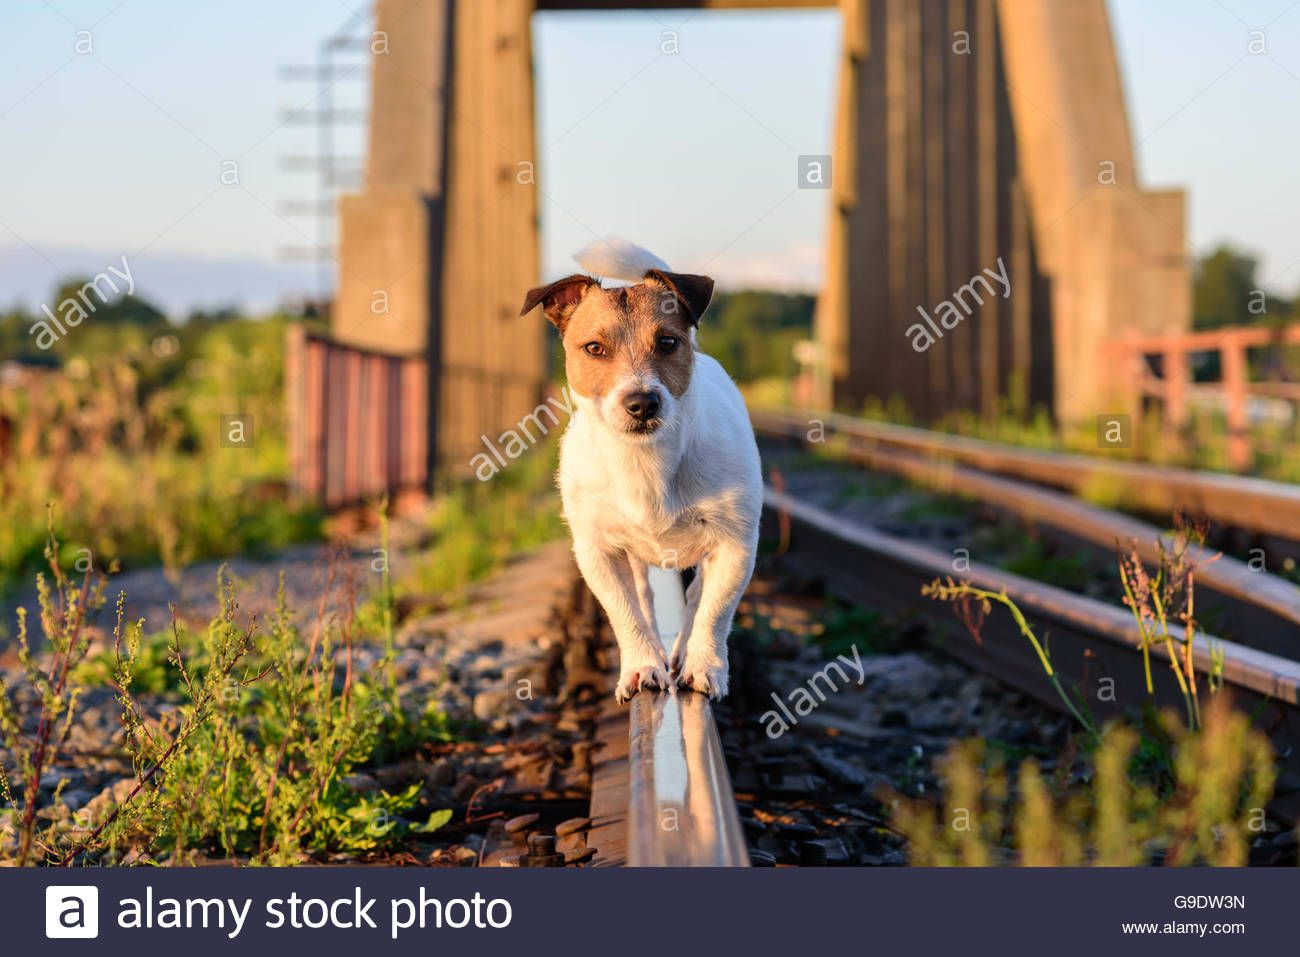 Three Stray Dogs Go Through The Railroad Tracks Stock